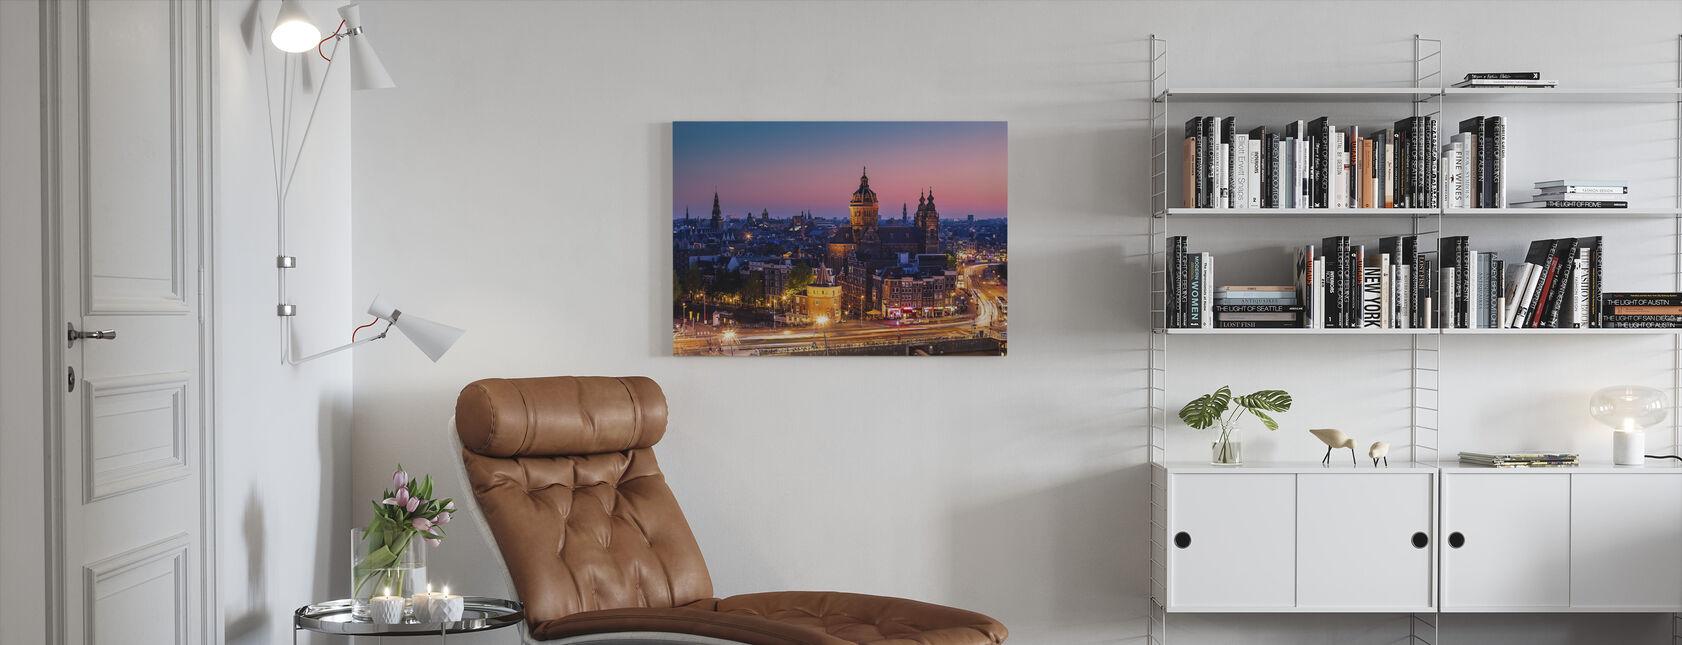 Amsterdam Stad - Canvas print - Woonkamer